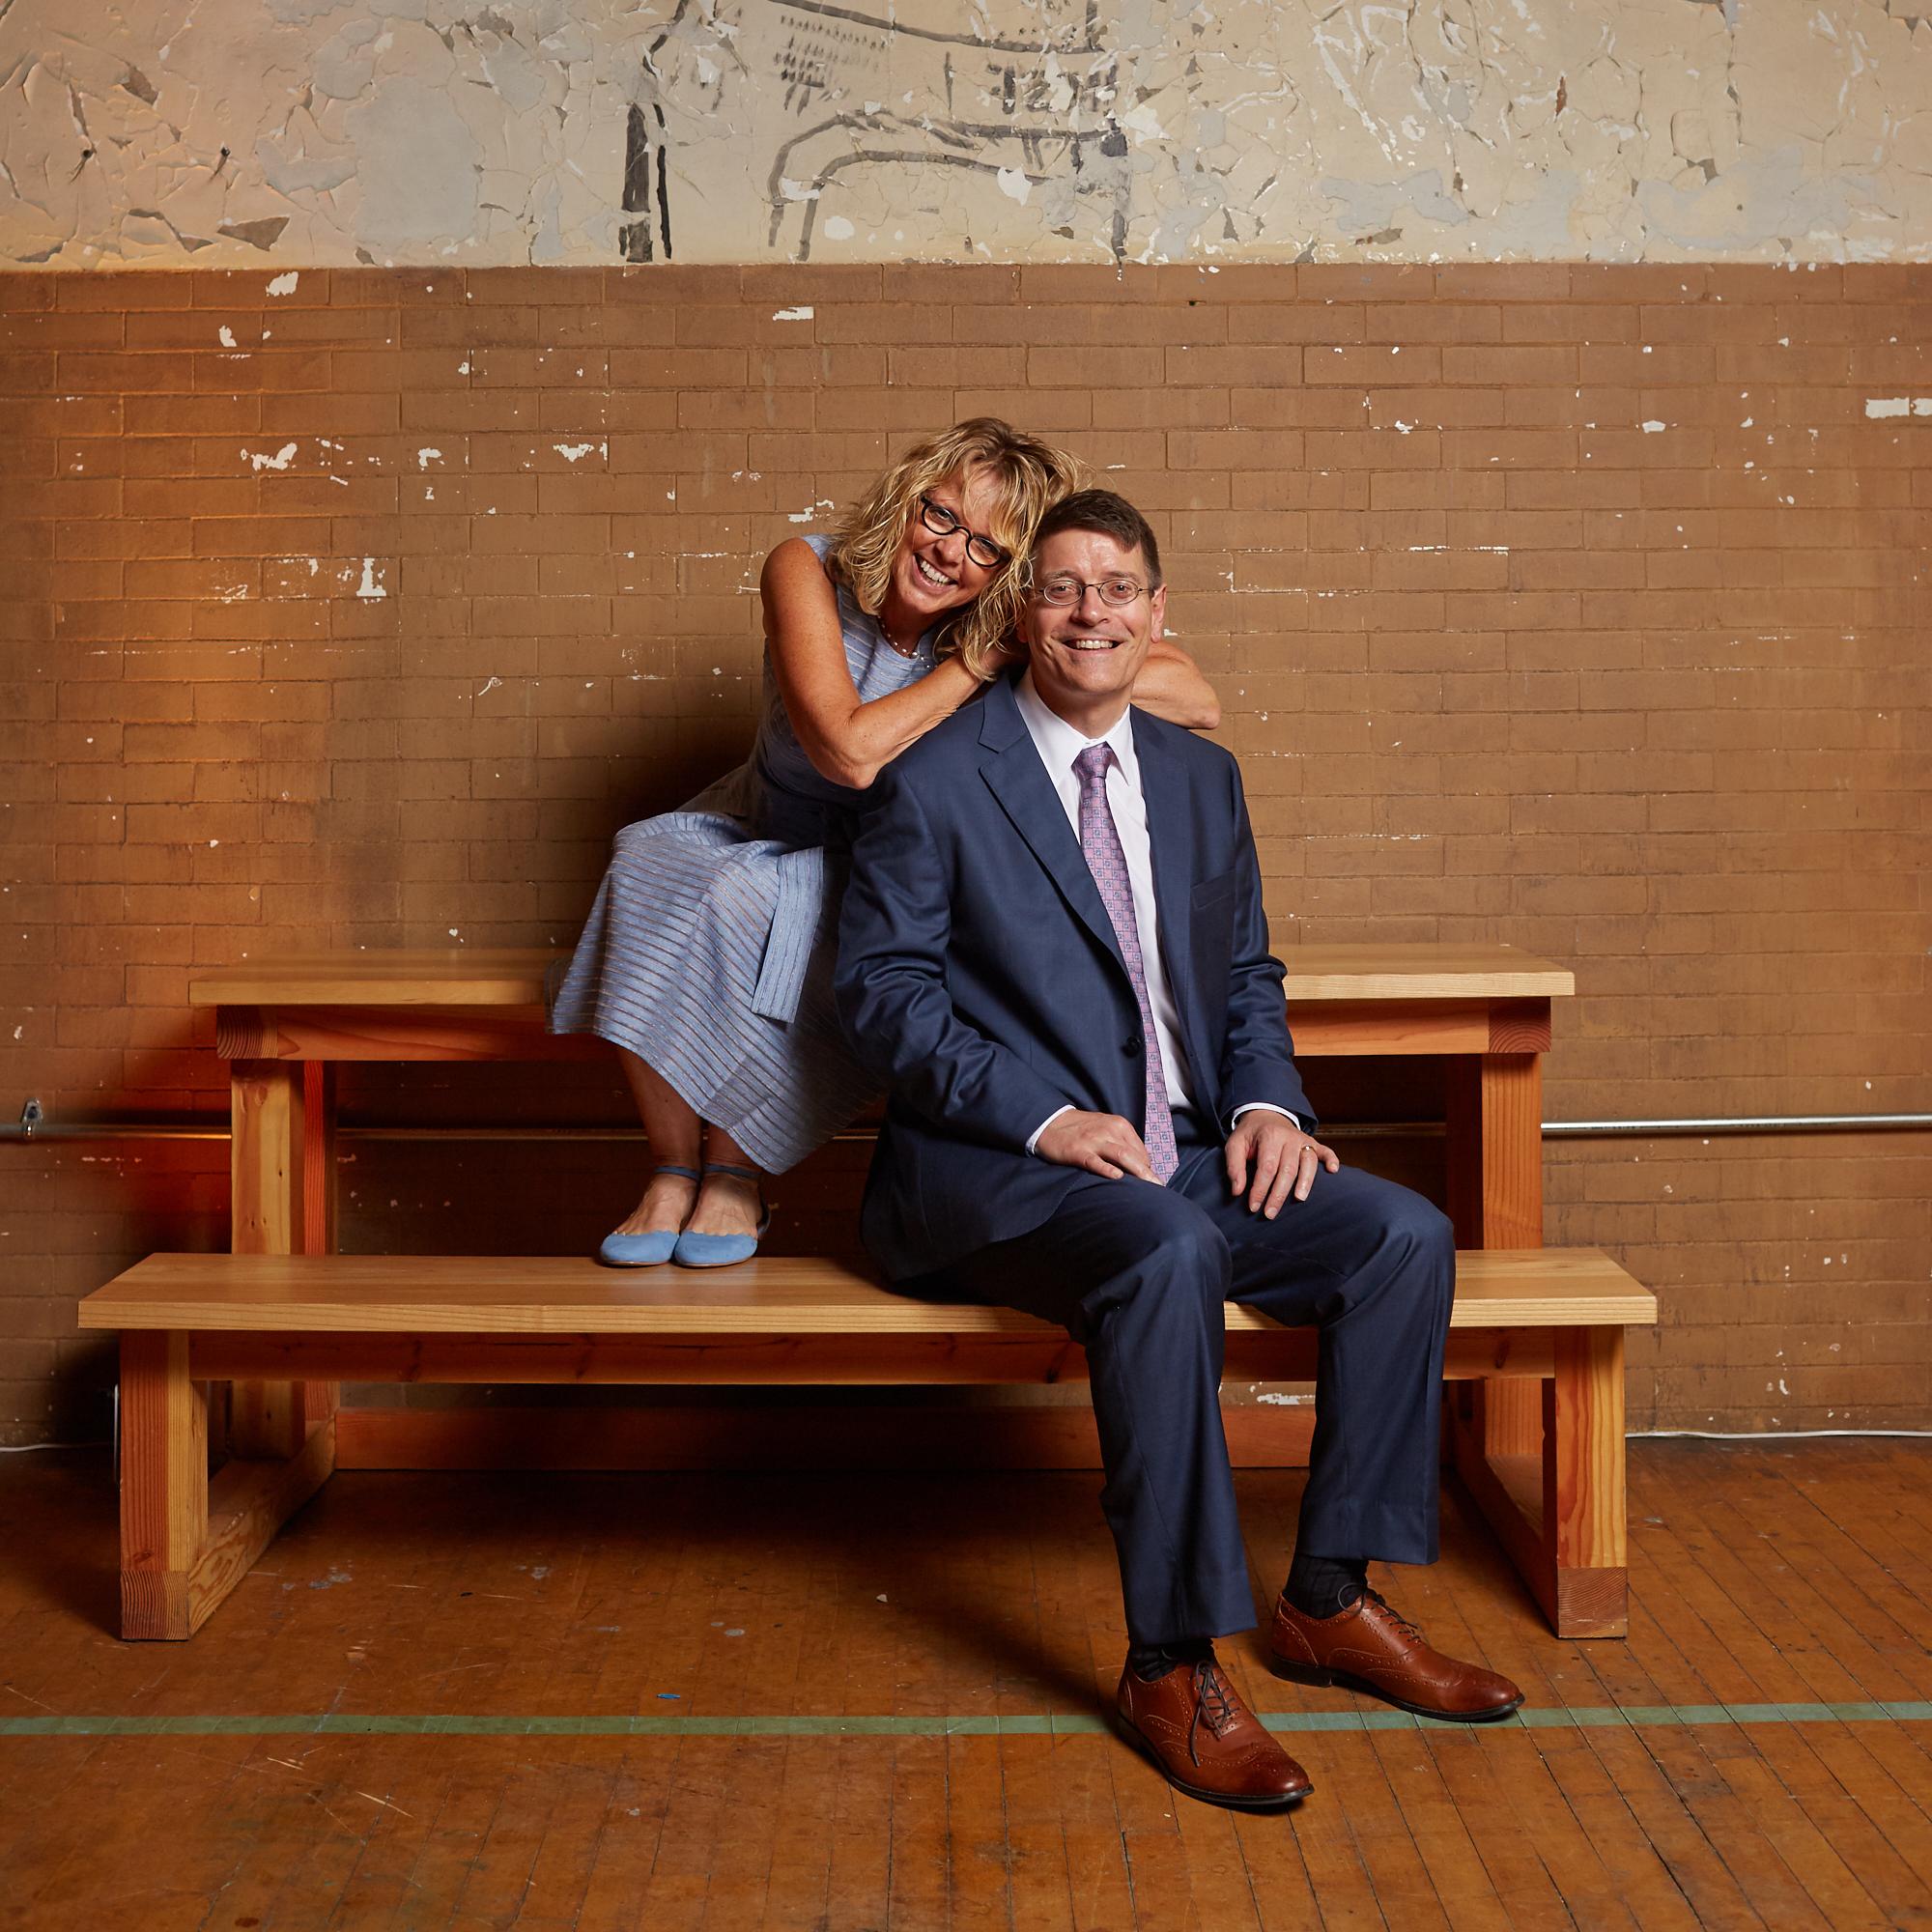 Ryan Hannah Sims - 2017.09 - Wedding Photos - 1056.jpg